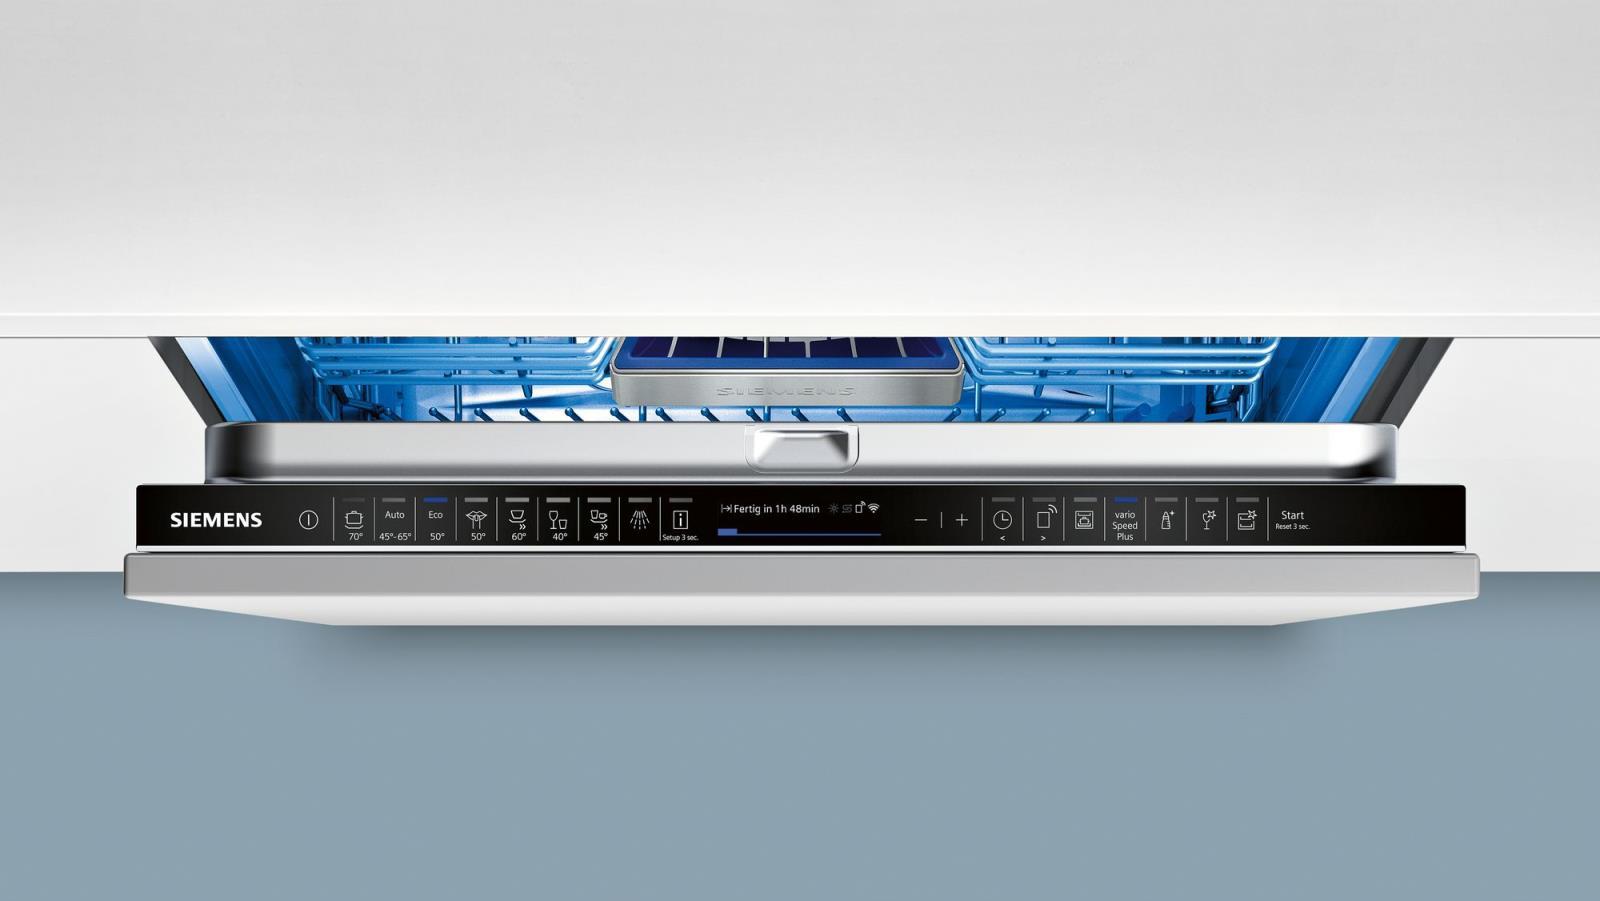 Lavastoviglie da Incasso SIEMENS SN678X36TE a €809 - New Shop Italia